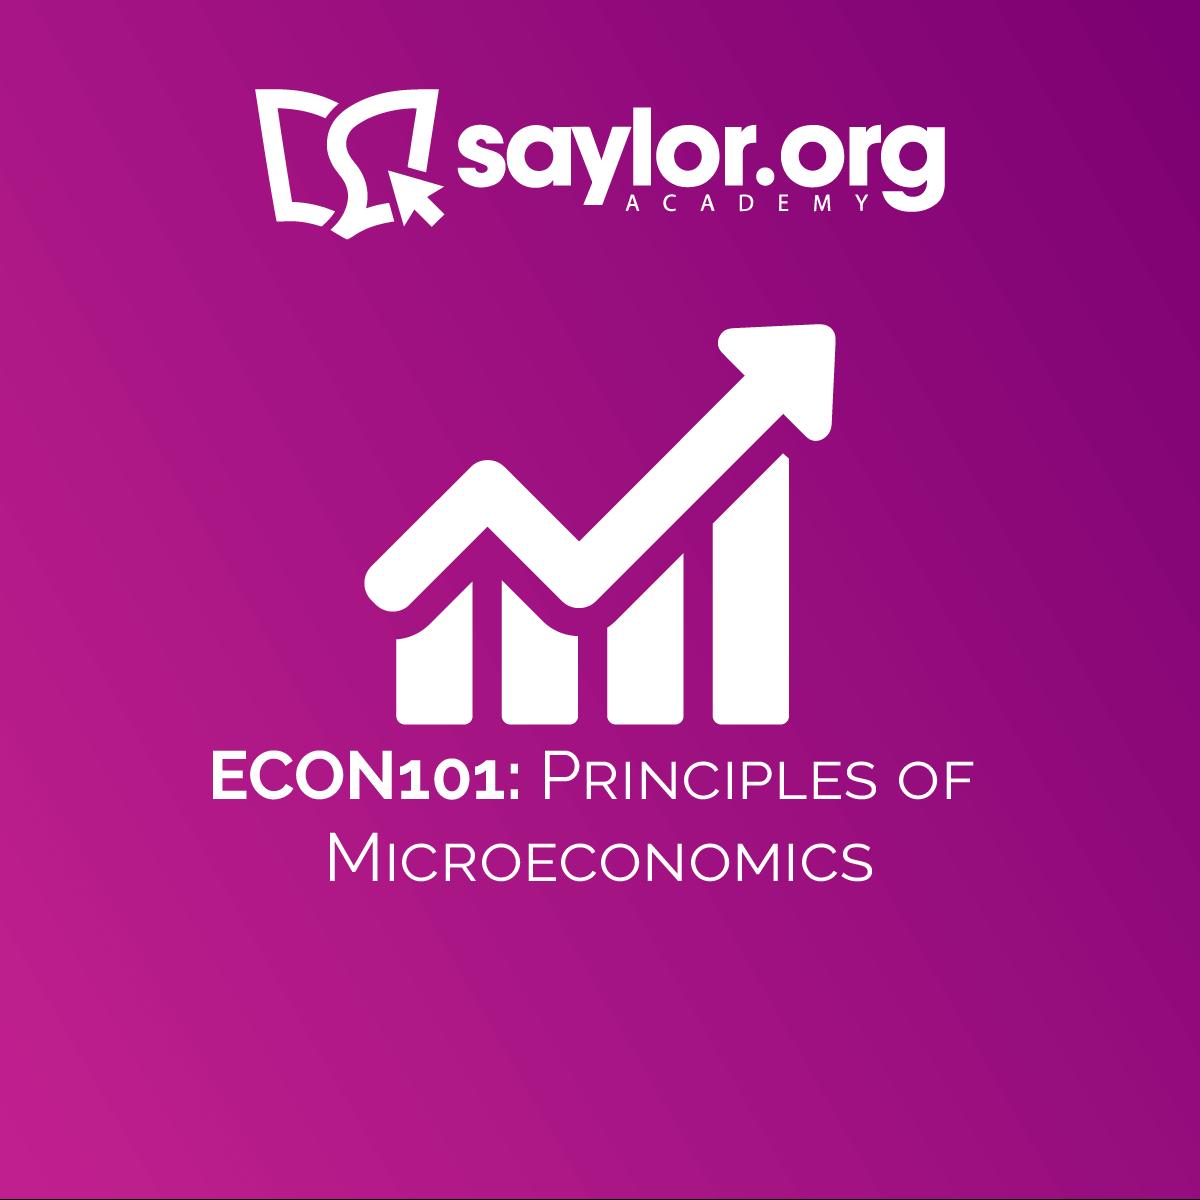 ECON101: Principles of Microeconomics | Saylor Academy